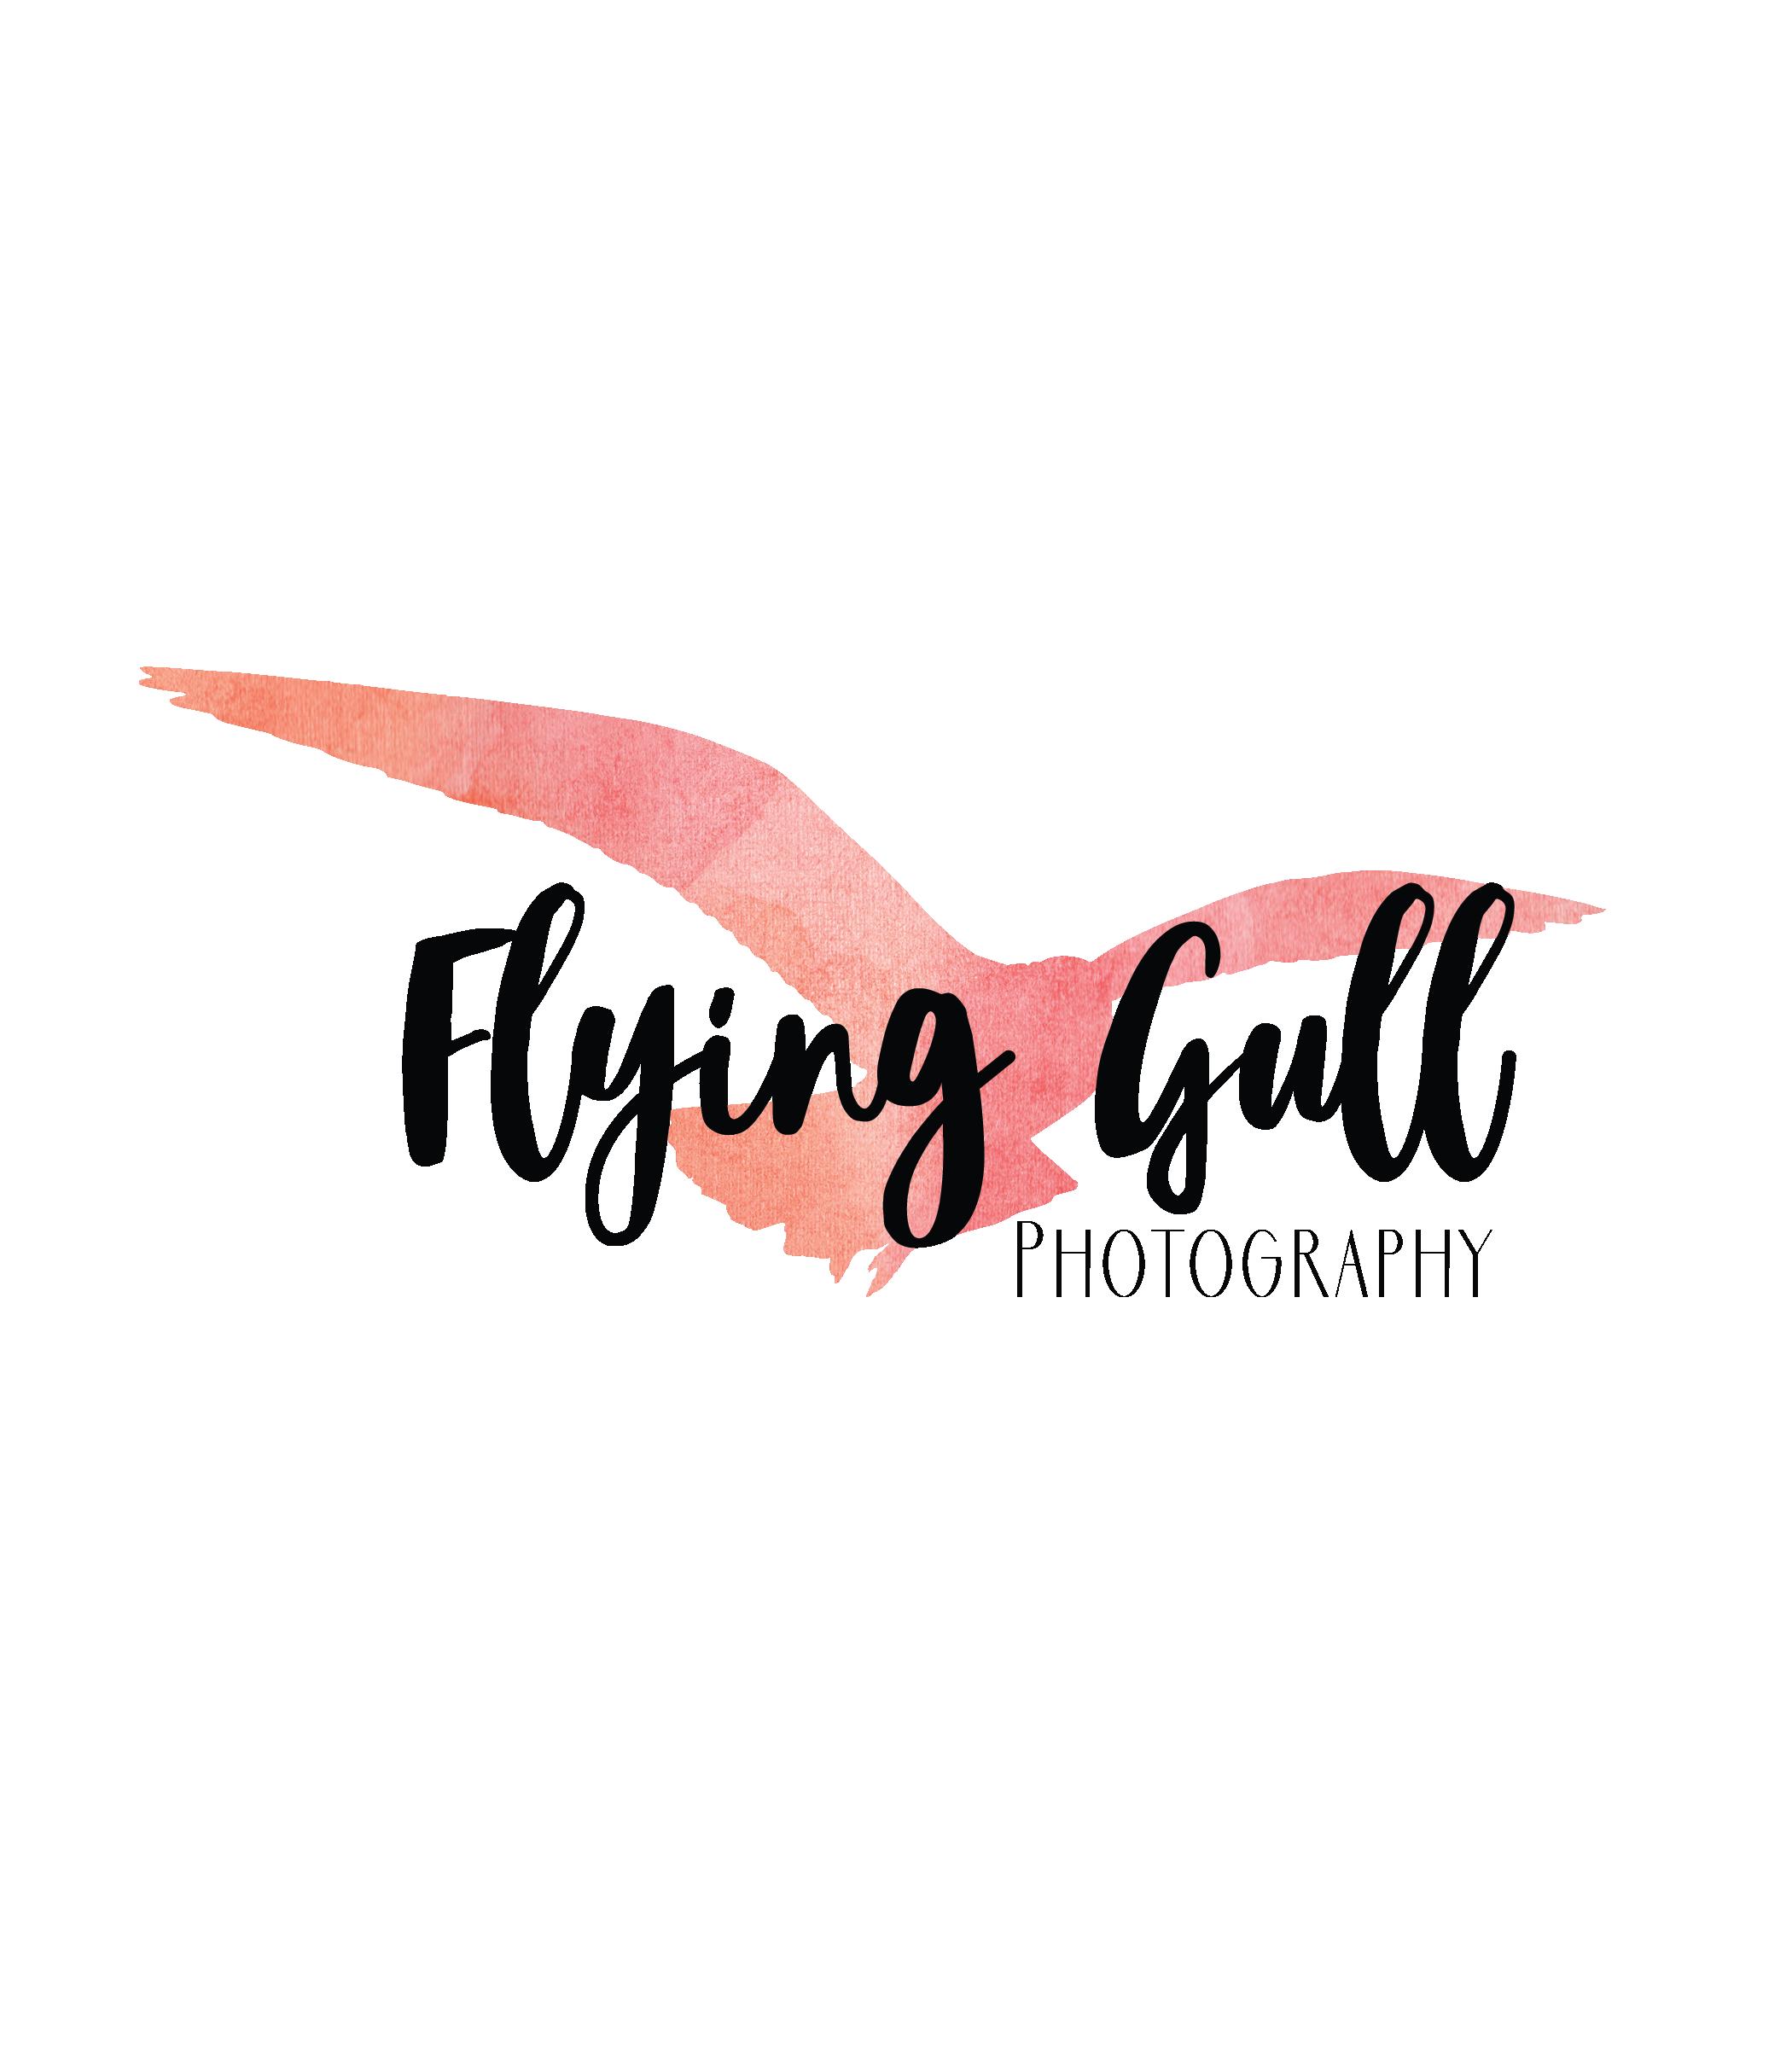 Flying Gull Photography logo